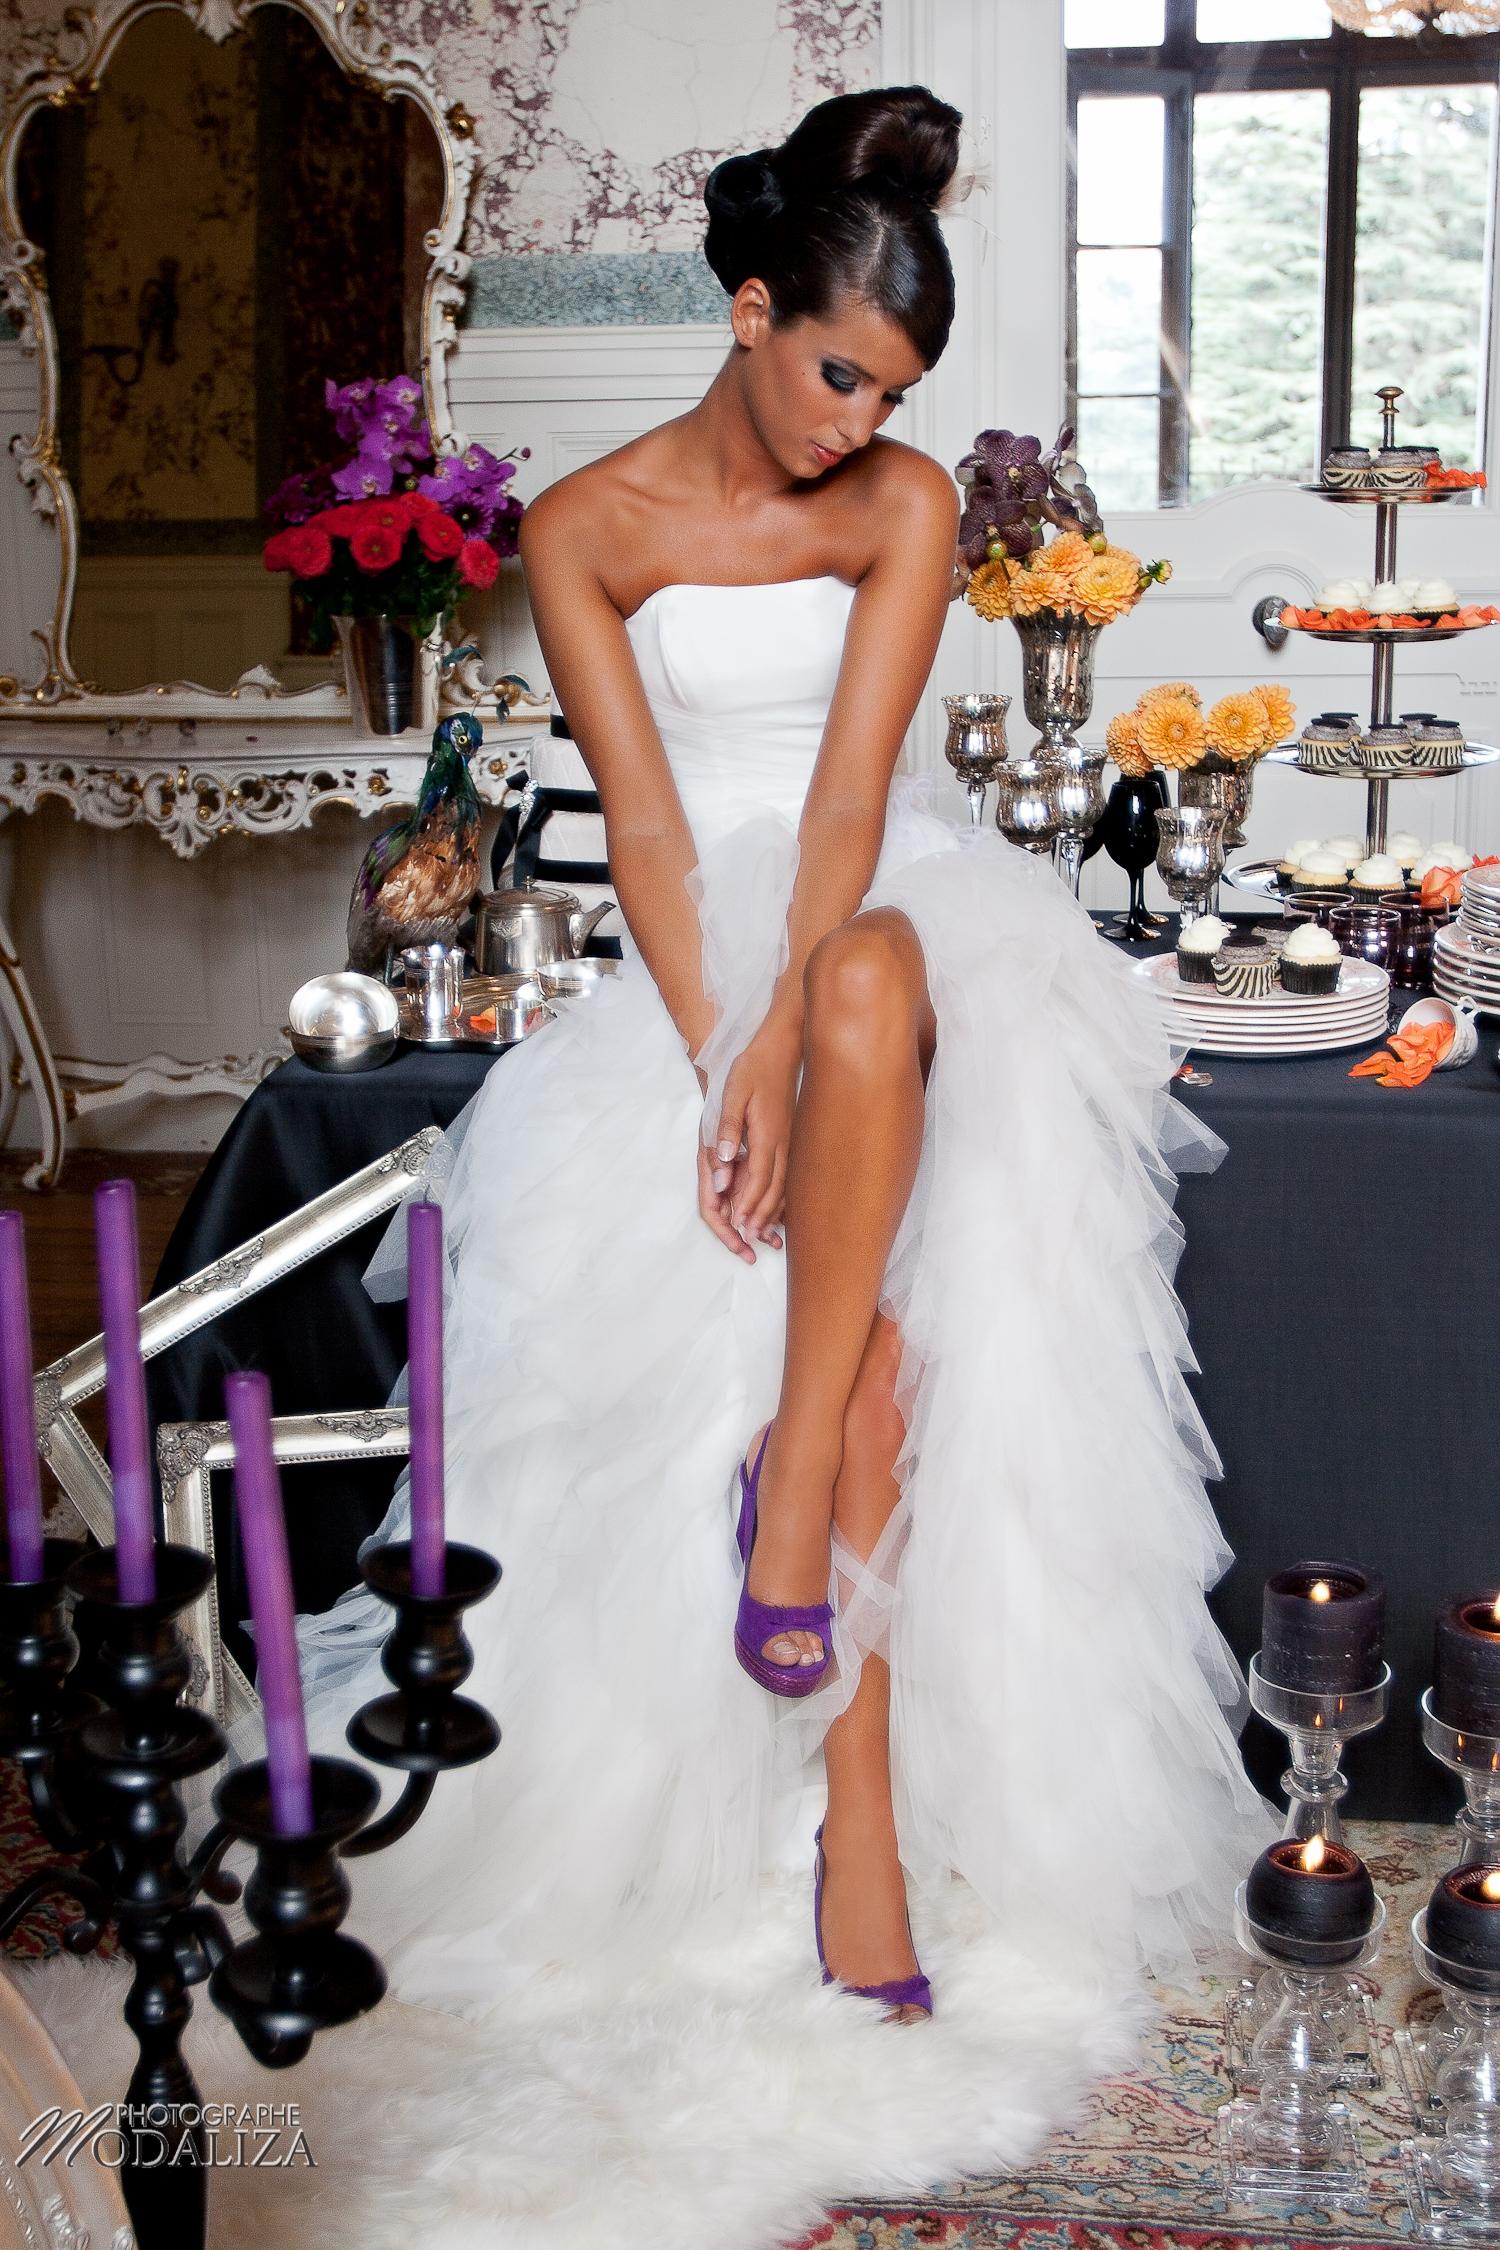 photo mode inspiration mariage decoration argent noir violet wedding bride mariée shoes chaussures baroque rock fashion chateau grenade castle gironde by modaliza-0901-2